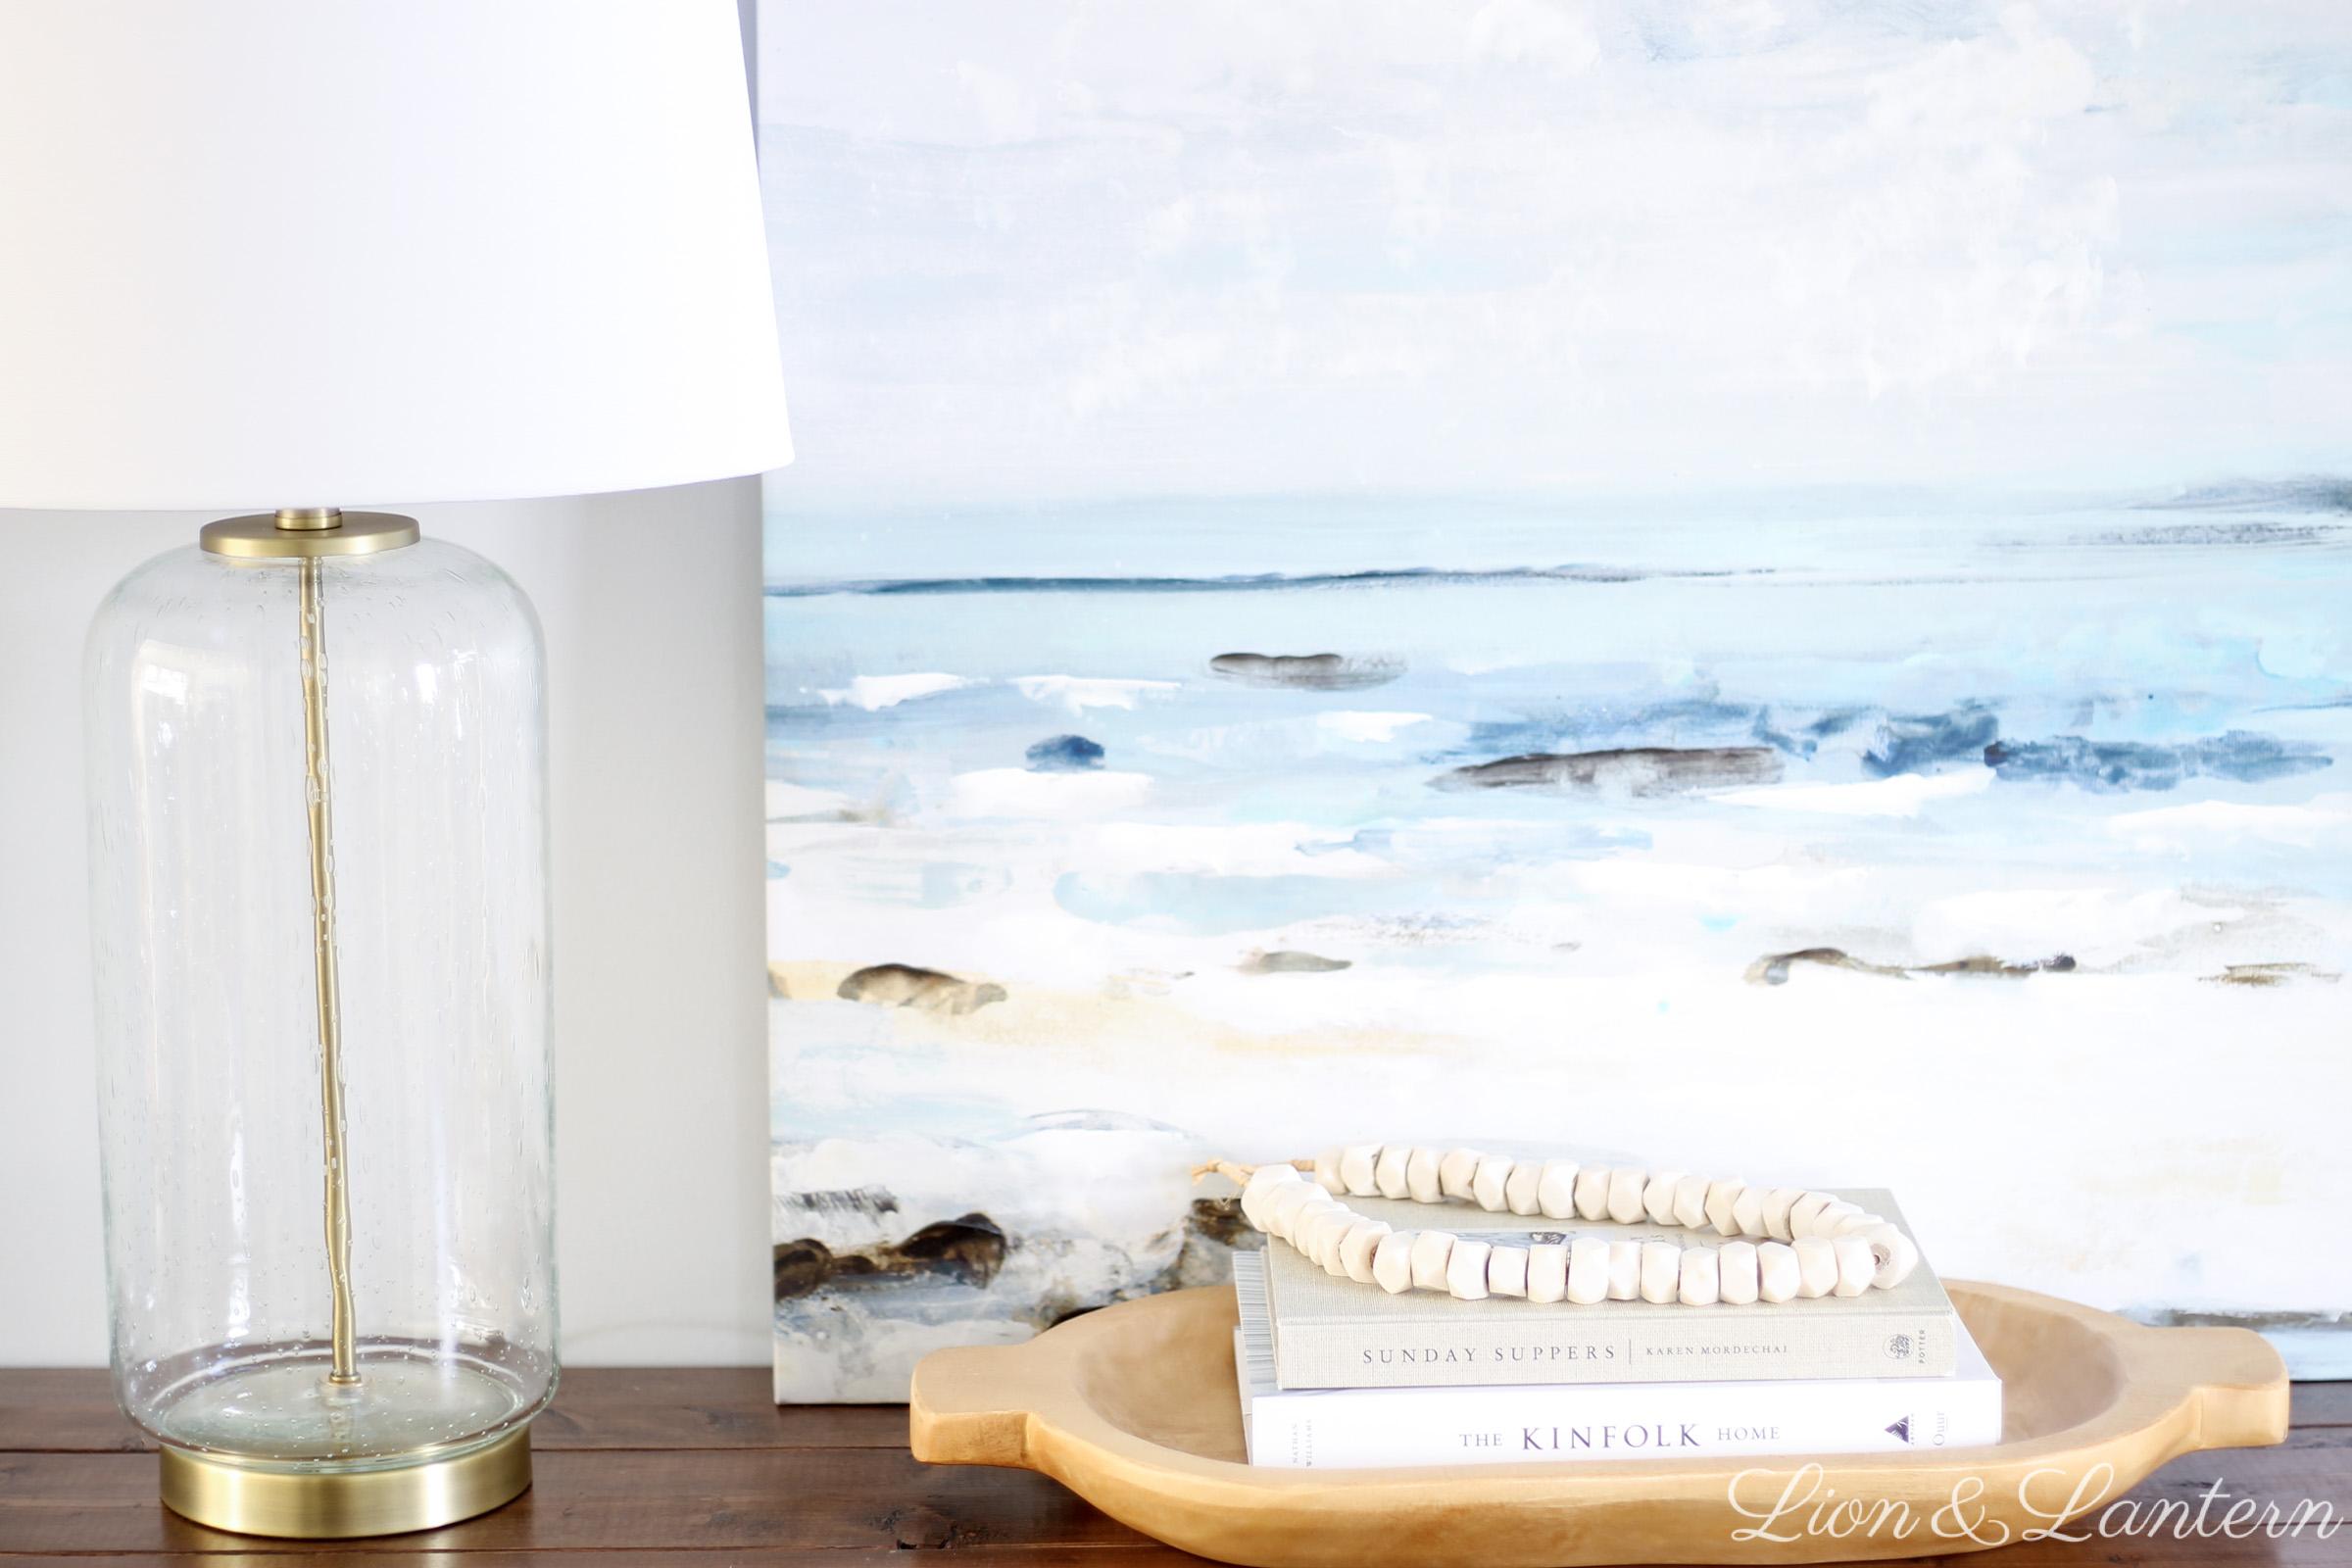 Easy Coastal Entryway Styling at LionAndLantern.com | coastal farmhouse, casual decor, modern, minimalist, bone beads, ocean painting, Ana White rustic x console